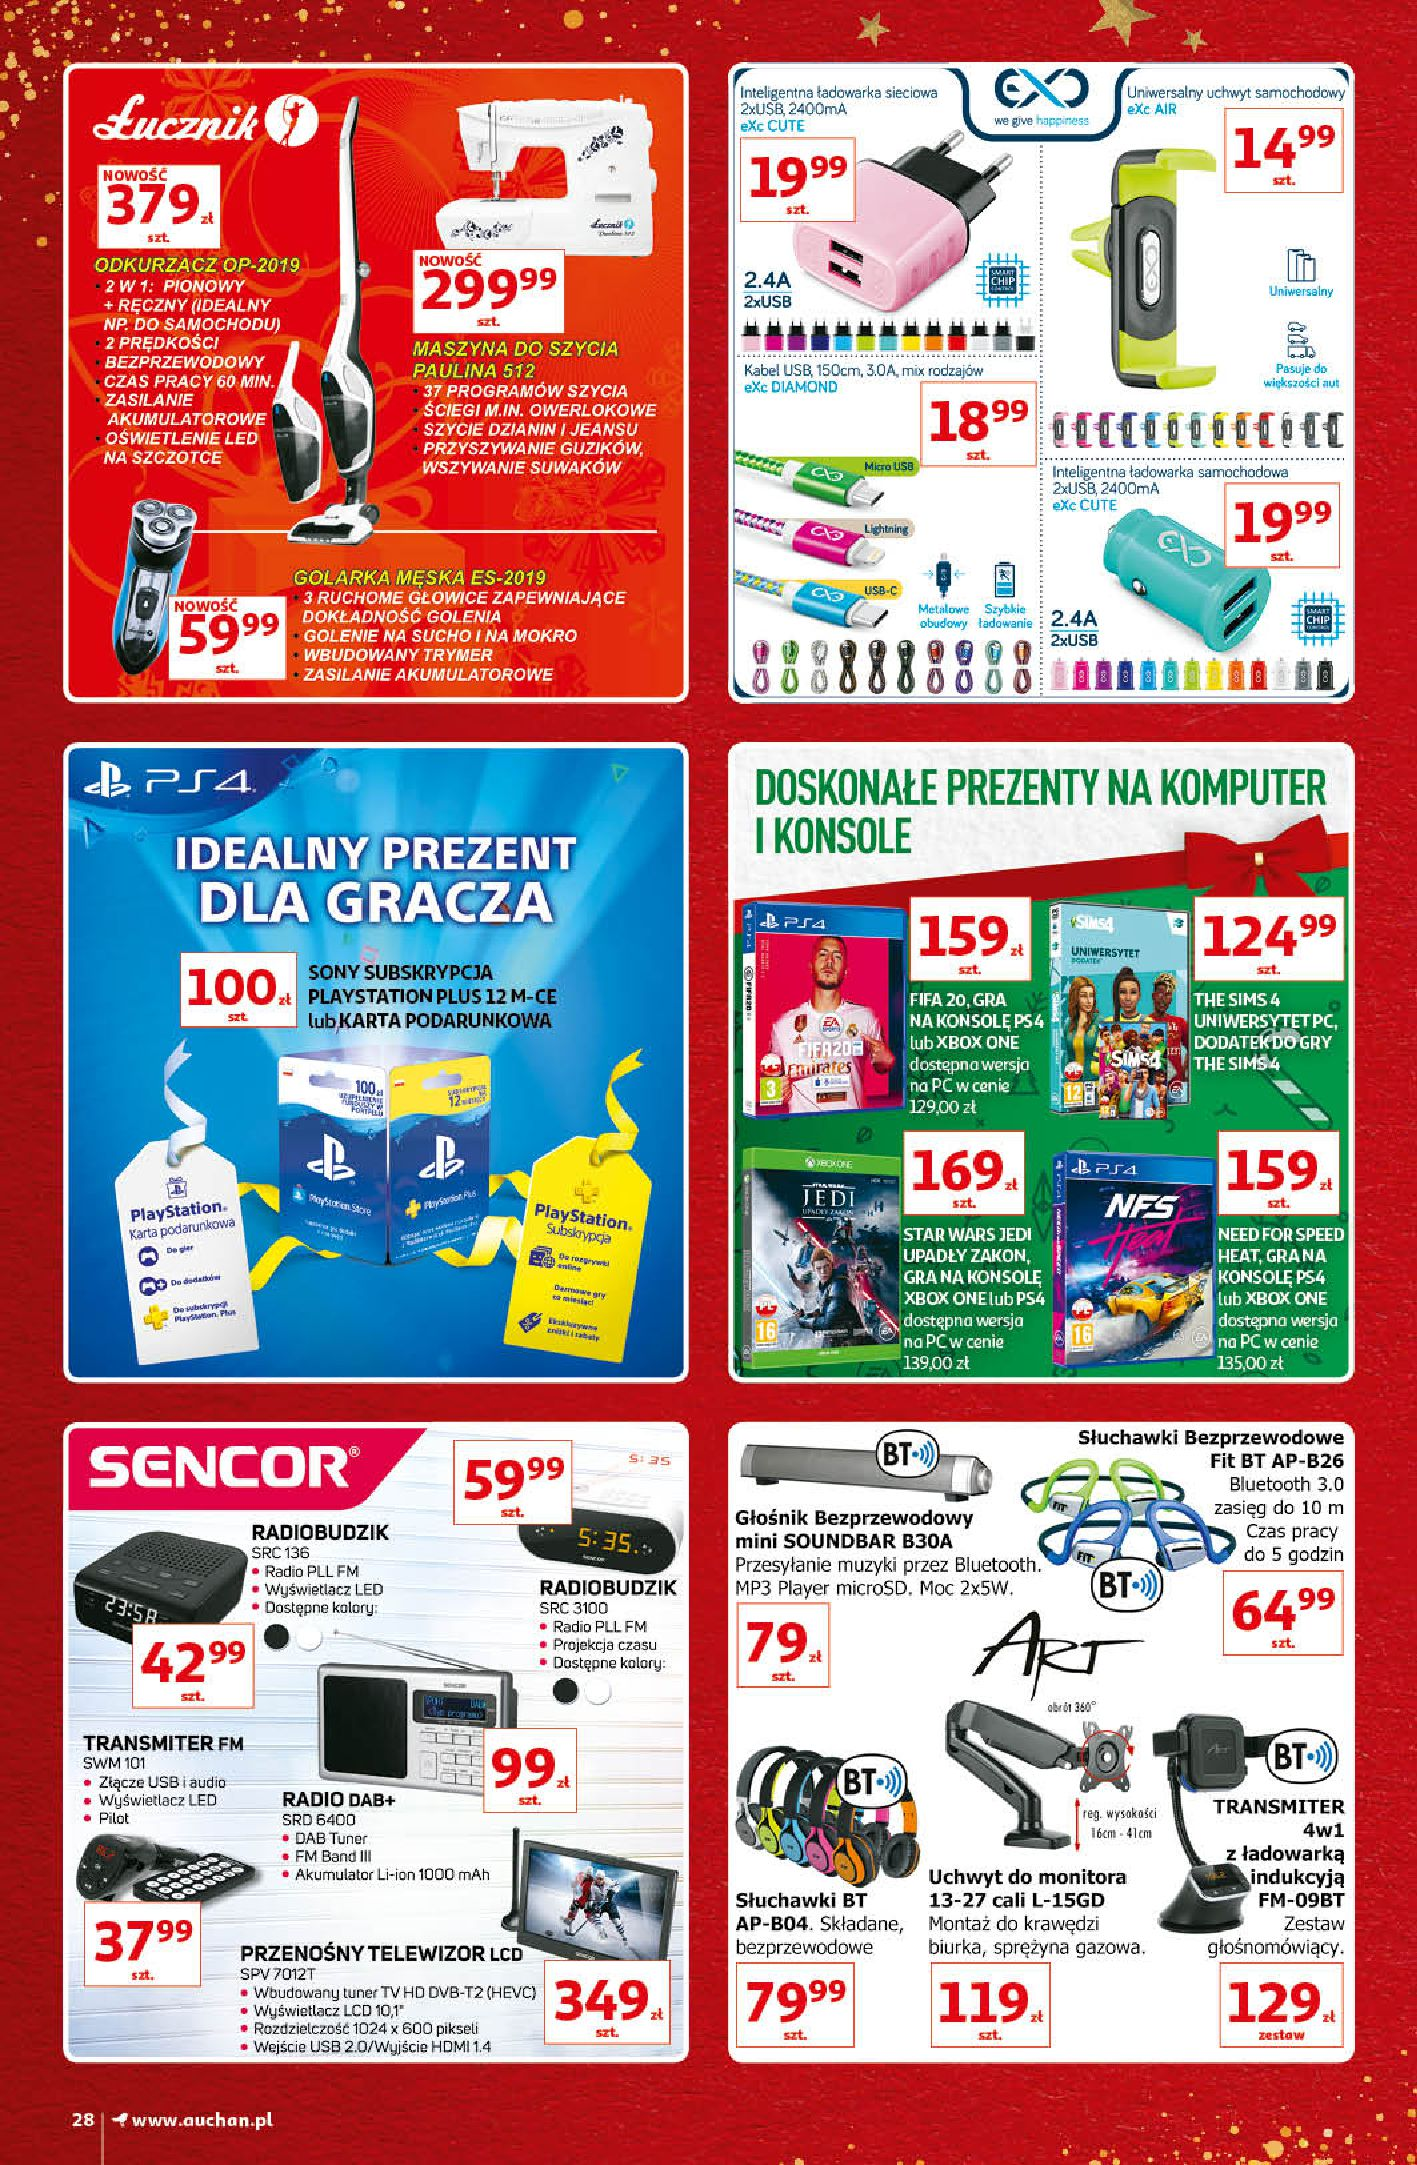 Gazetka Auchan - Kultowe Marki Hipermarkety-04.12.2019-15.12.2019-page-28